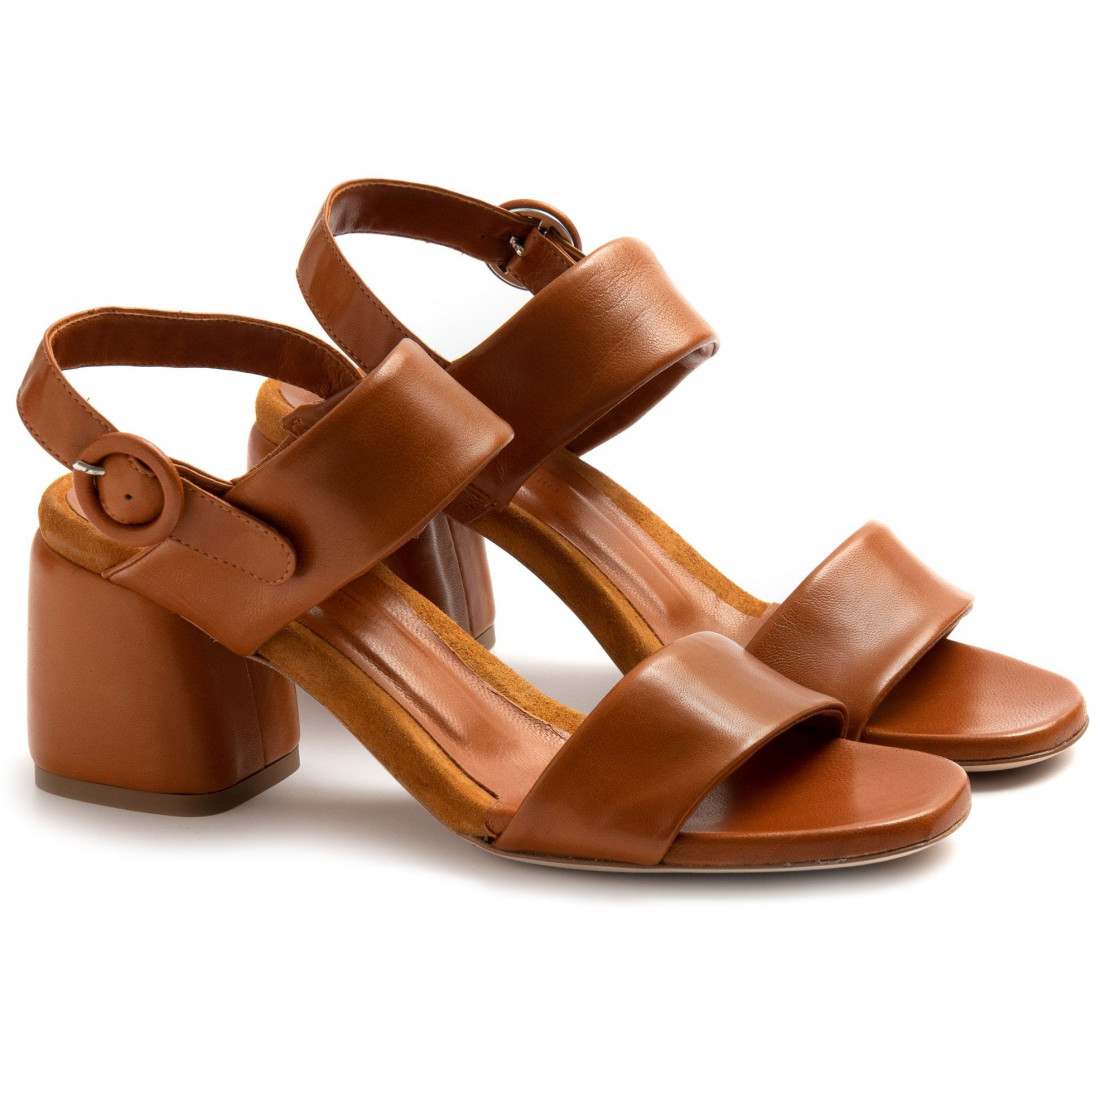 sandalen damen lorenzo masiero 21113spicy brown 8577